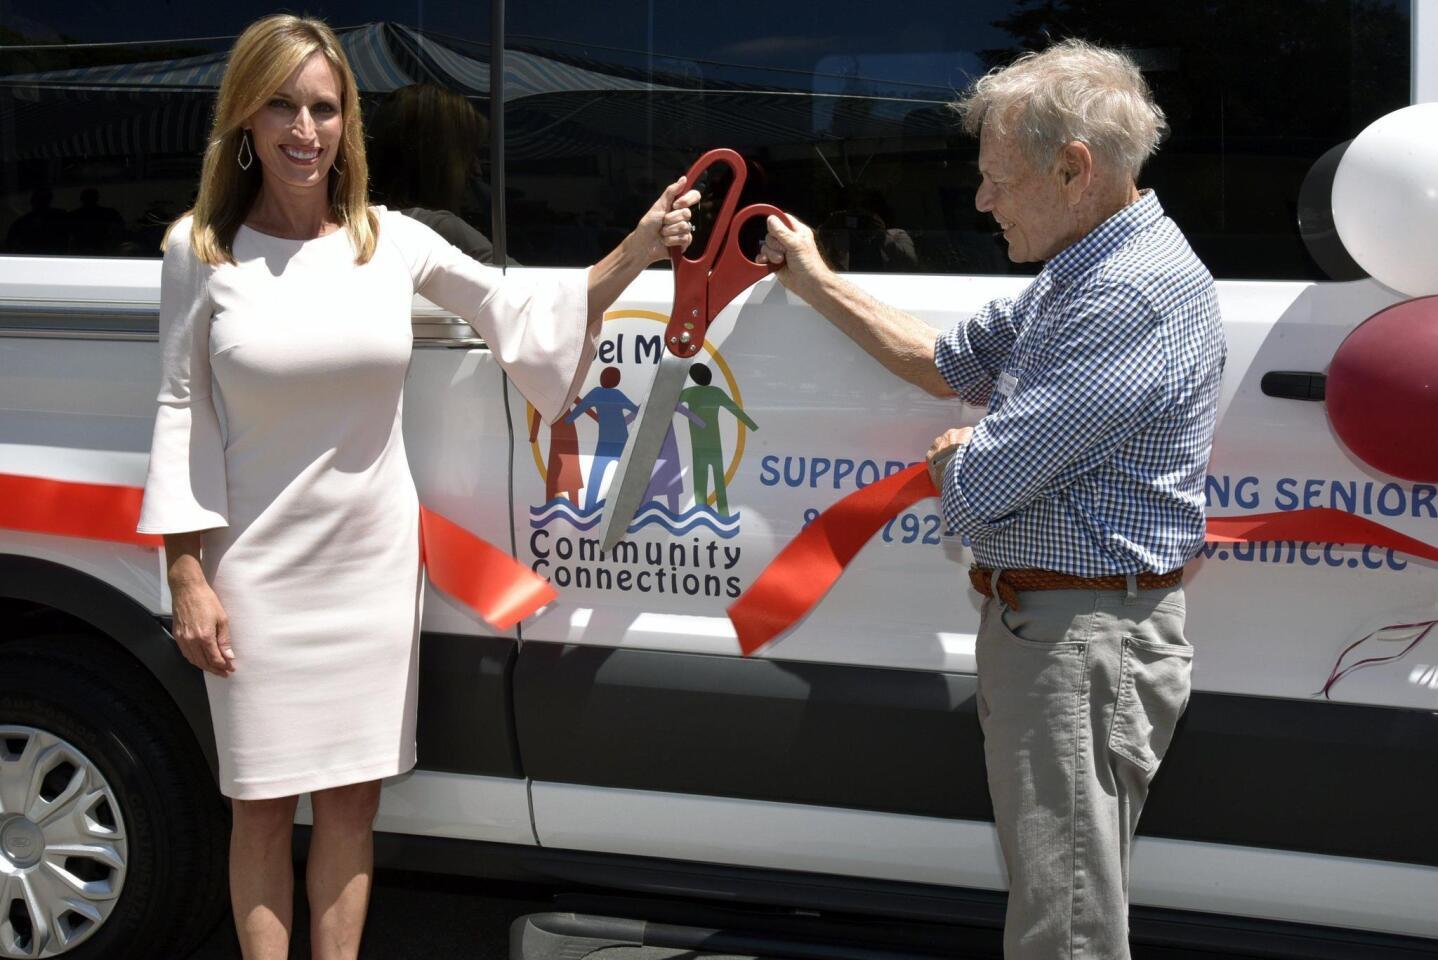 San Diego County Board of Supervisors Chairwoman Kristin Gaspar and DMCC President Terry Kopanski cutting the ribbon for the van dedication